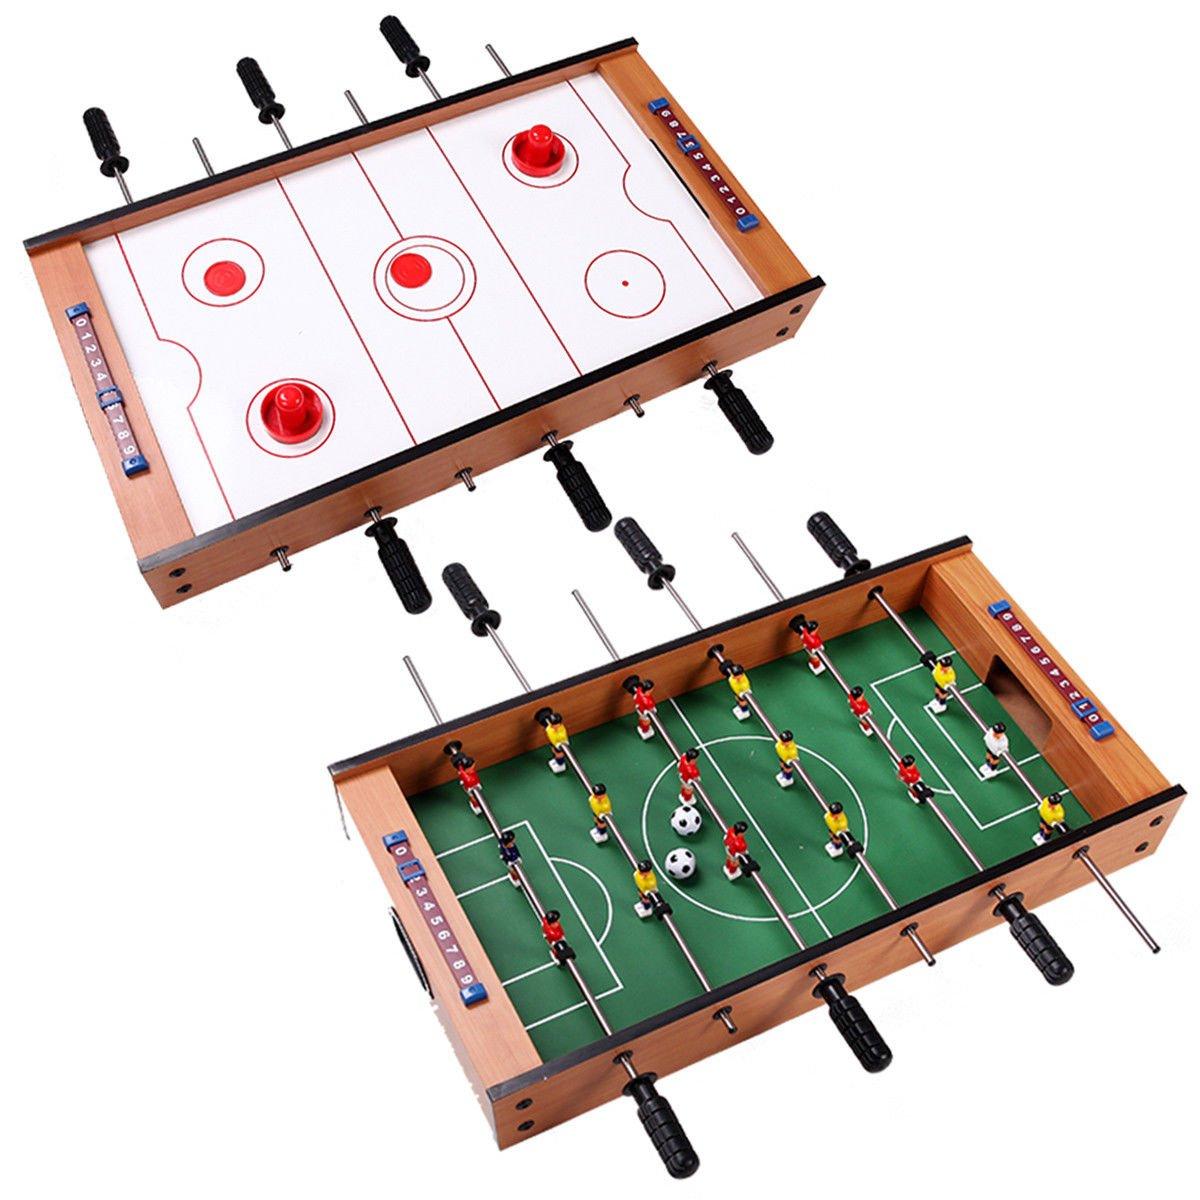 Giantex Multi Game Table Pool Air Hockey Foosball Table Tennis Billiard Combination  Game Table